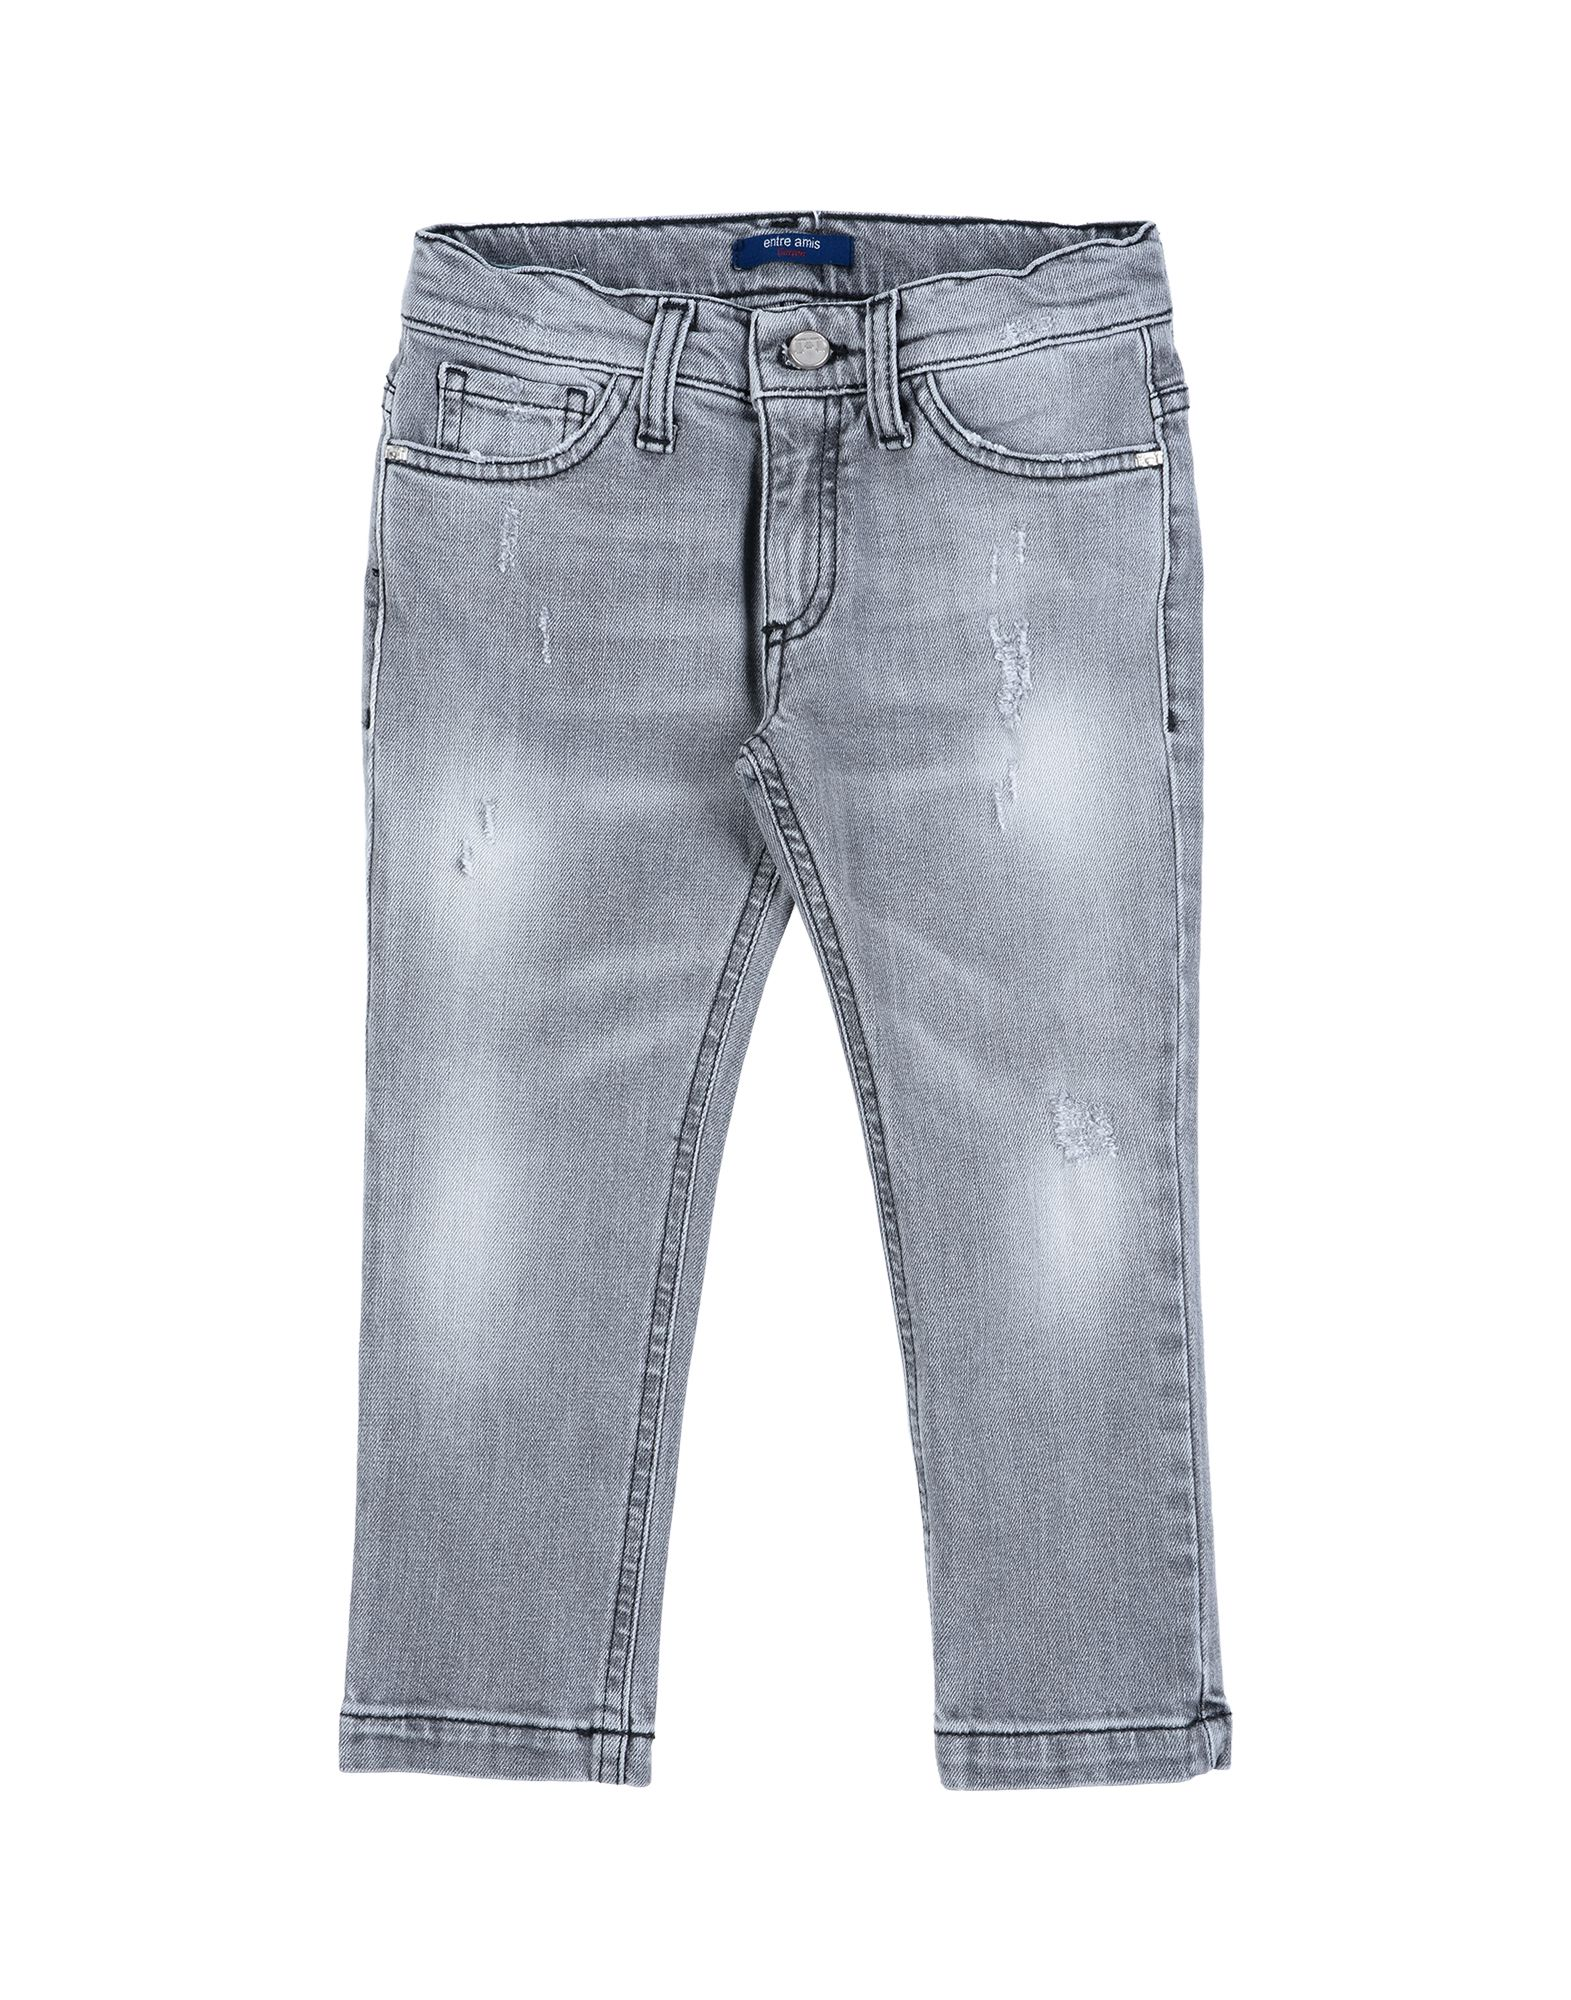 Entre Amis Garçon Kids' Jeans In Grey